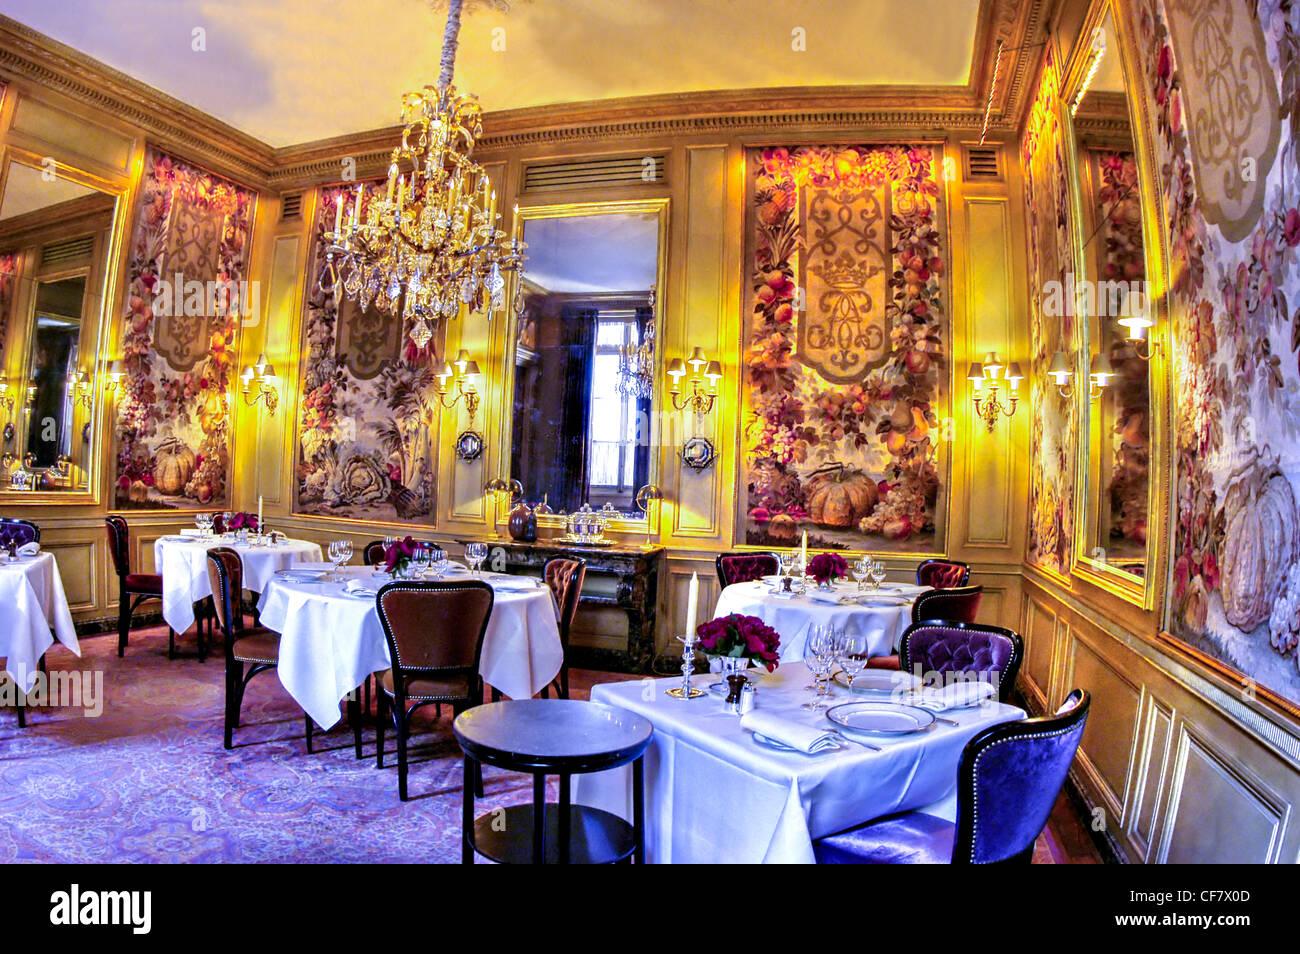 paris france haute cuisine fancy french restaurant l 39 ambroisie stock photo royalty free. Black Bedroom Furniture Sets. Home Design Ideas